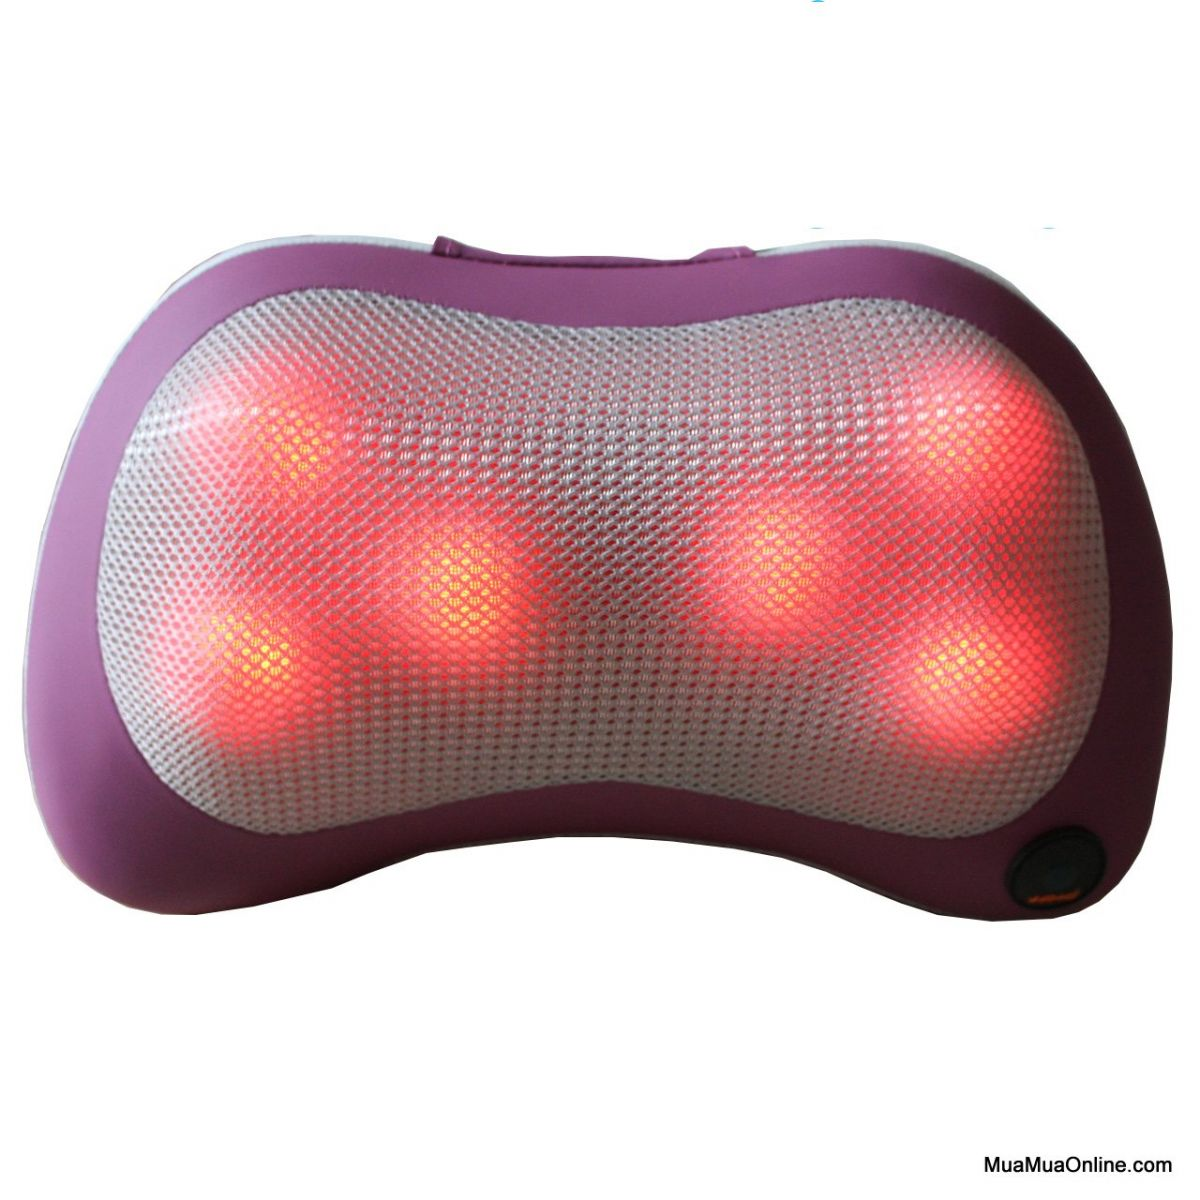 Gối Massage Hồng Ngoại Magic Pillow Pl-898